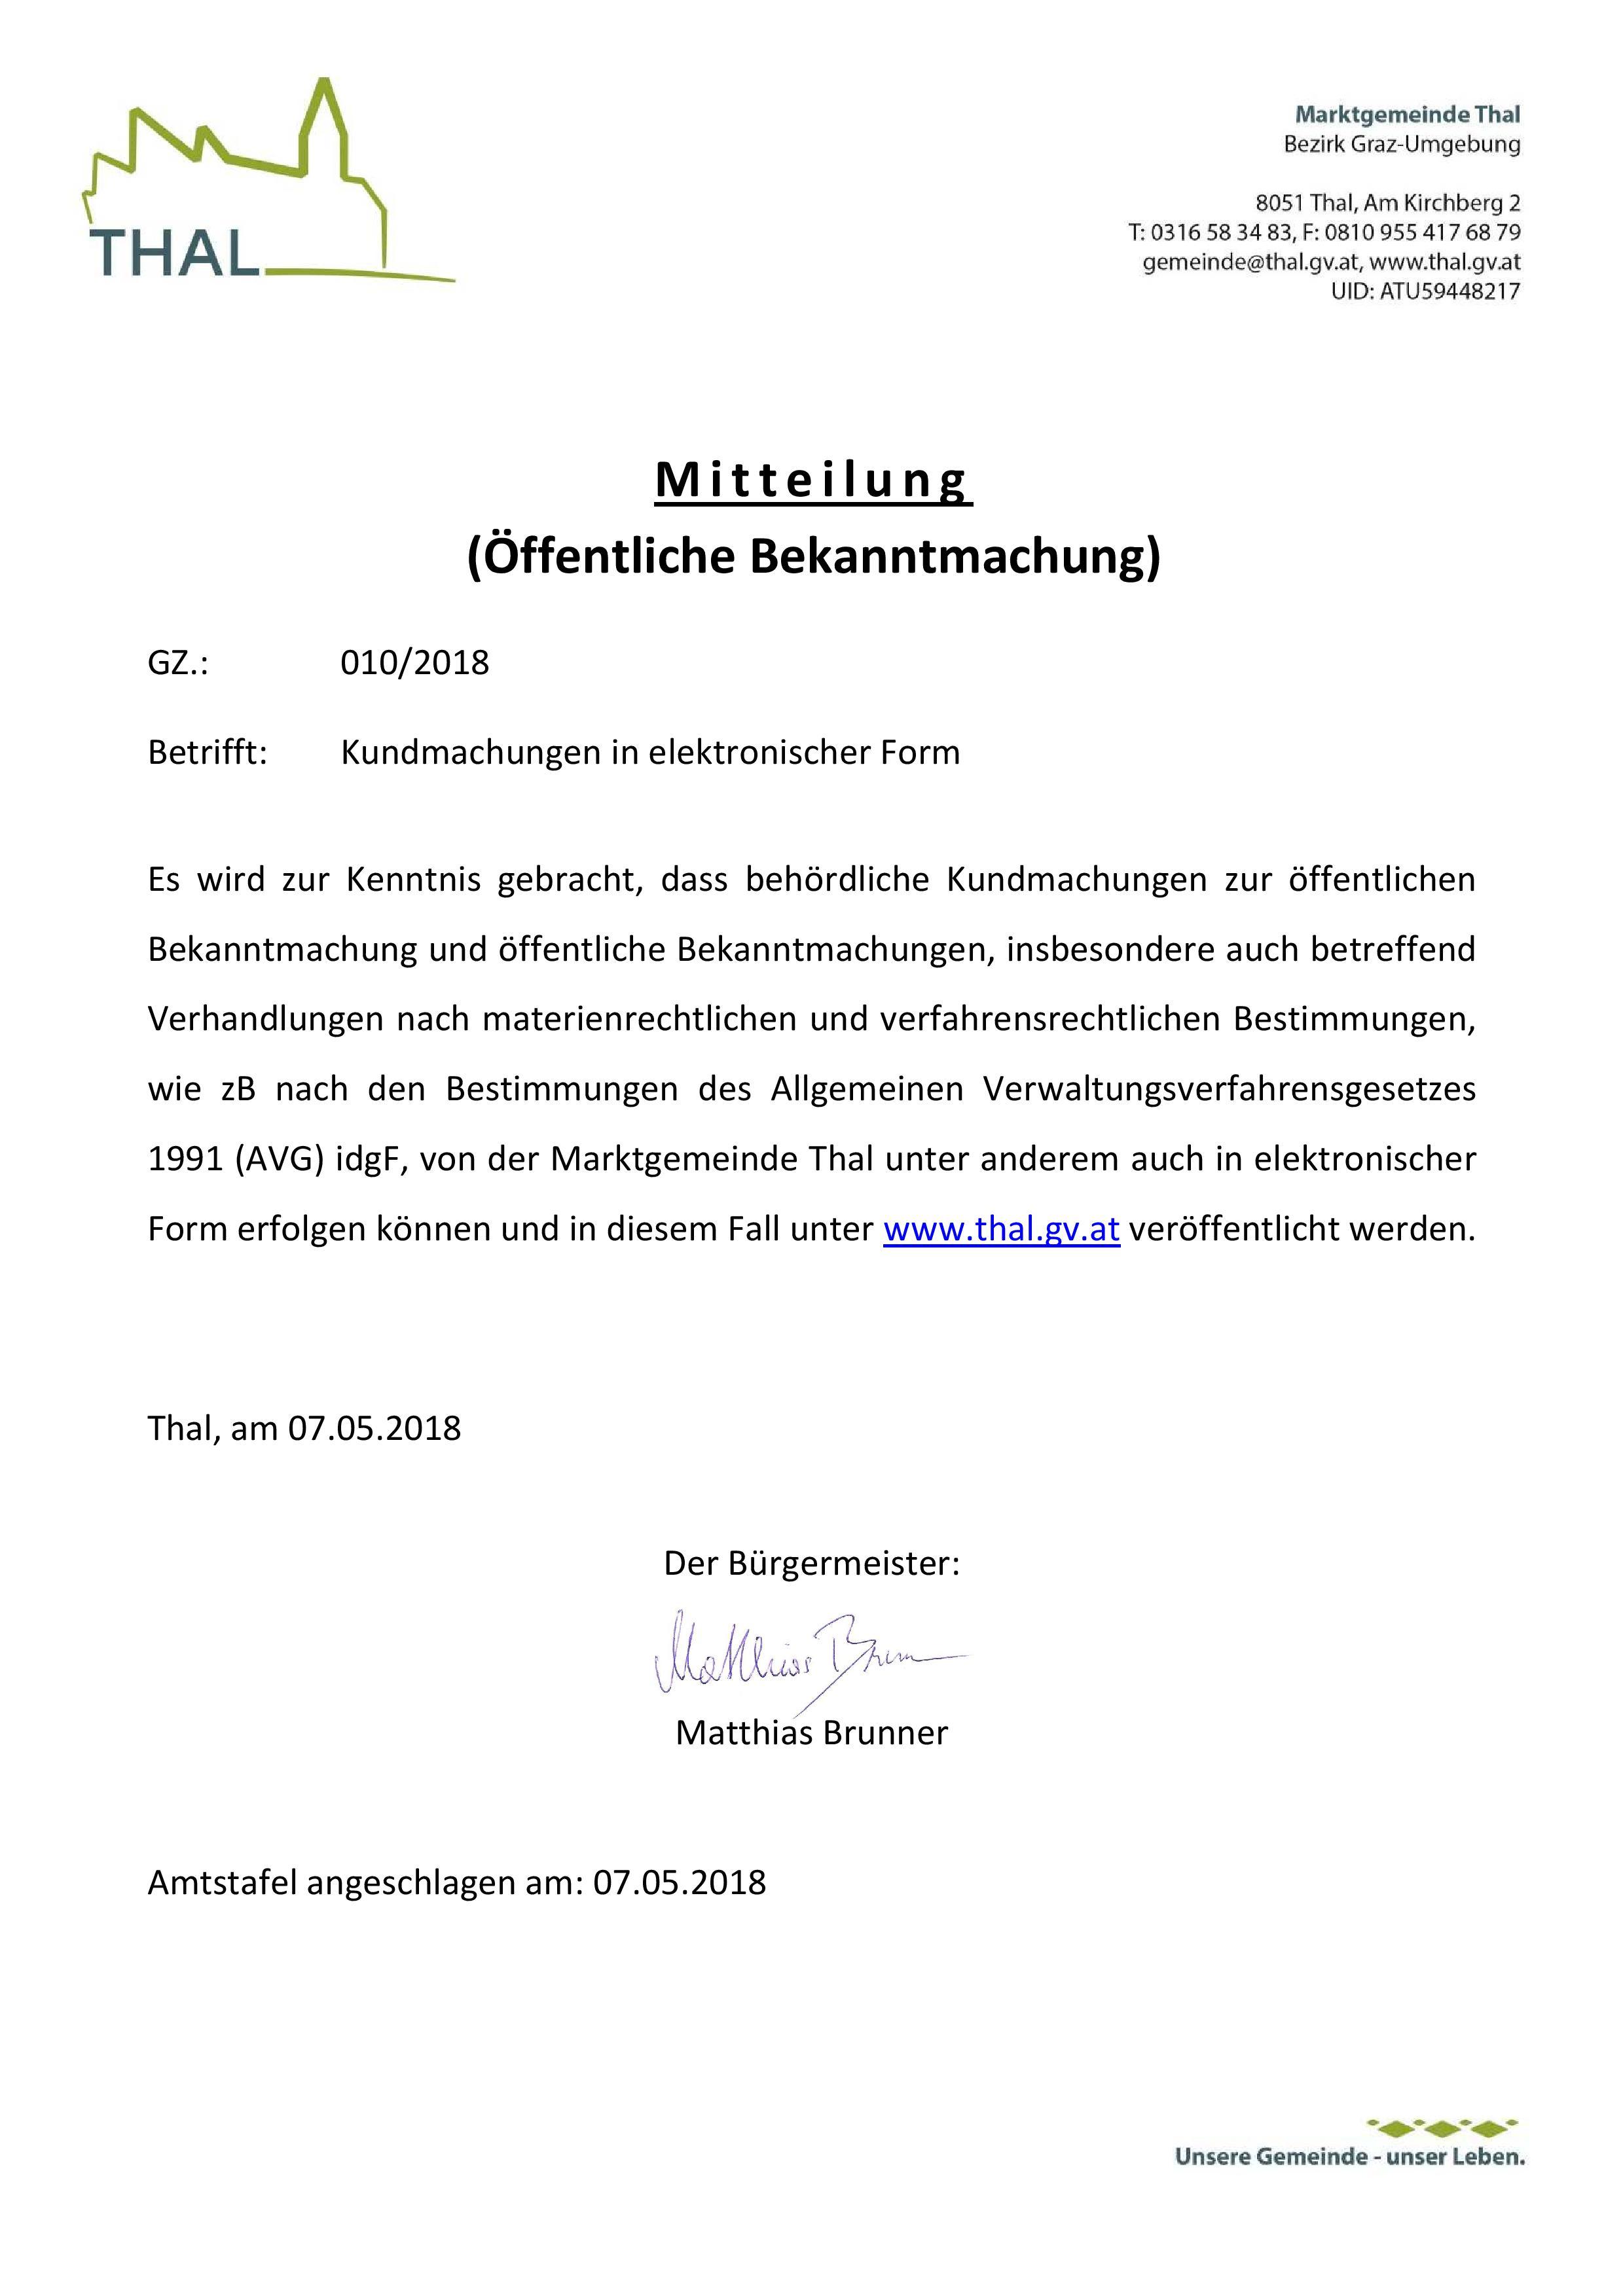 kundmachung-elektronische.form-page-001